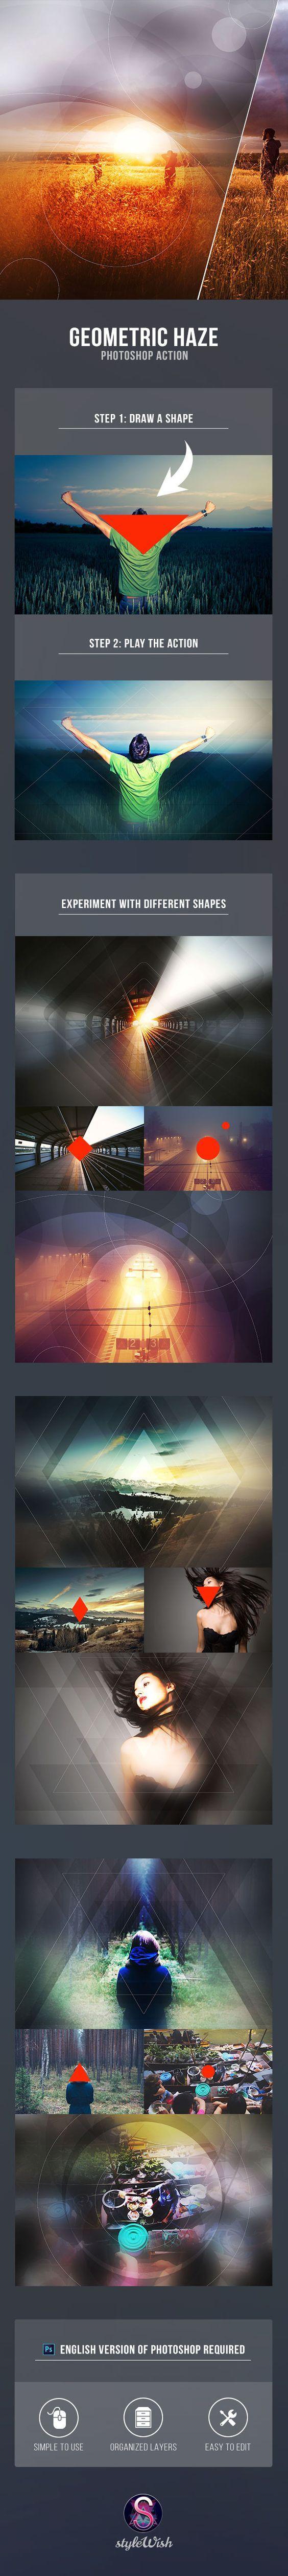 Geometric Haze Photoshop Action - Photo Effects Actions: